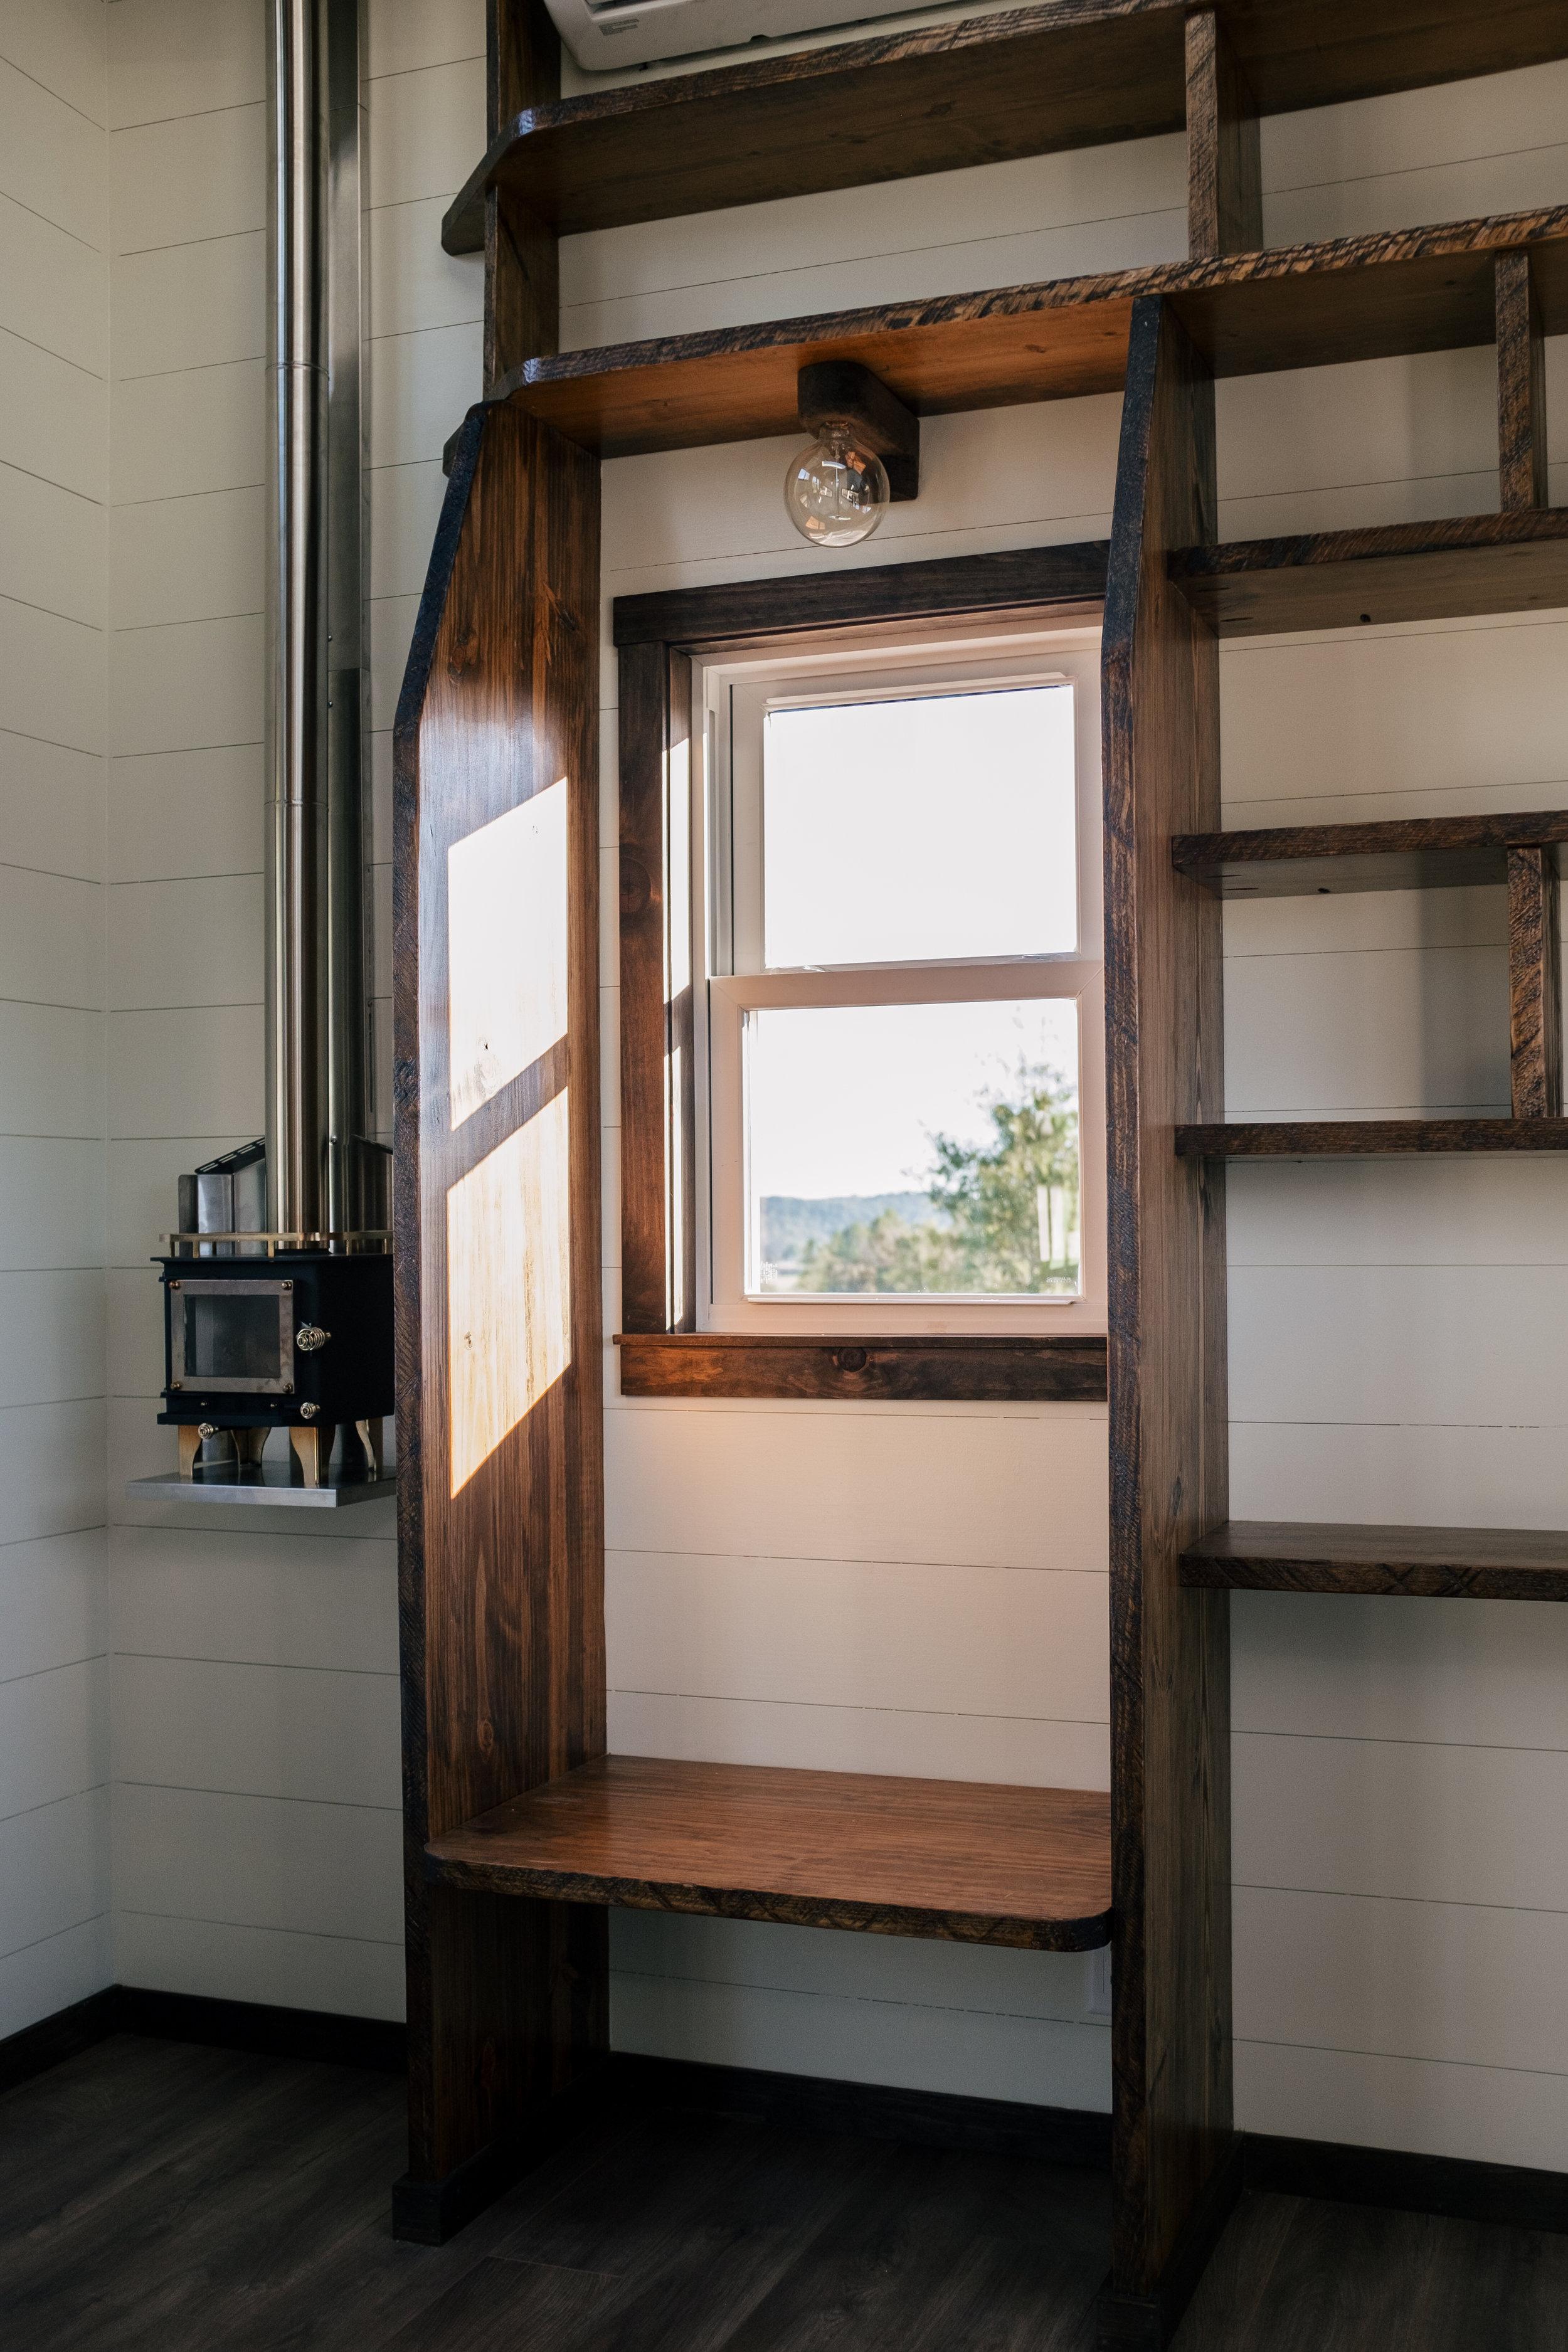 The Silhouette by Wind River Tiny Homes - ship lap, LED edison bulb light fixture, Cubic Mini wood stove